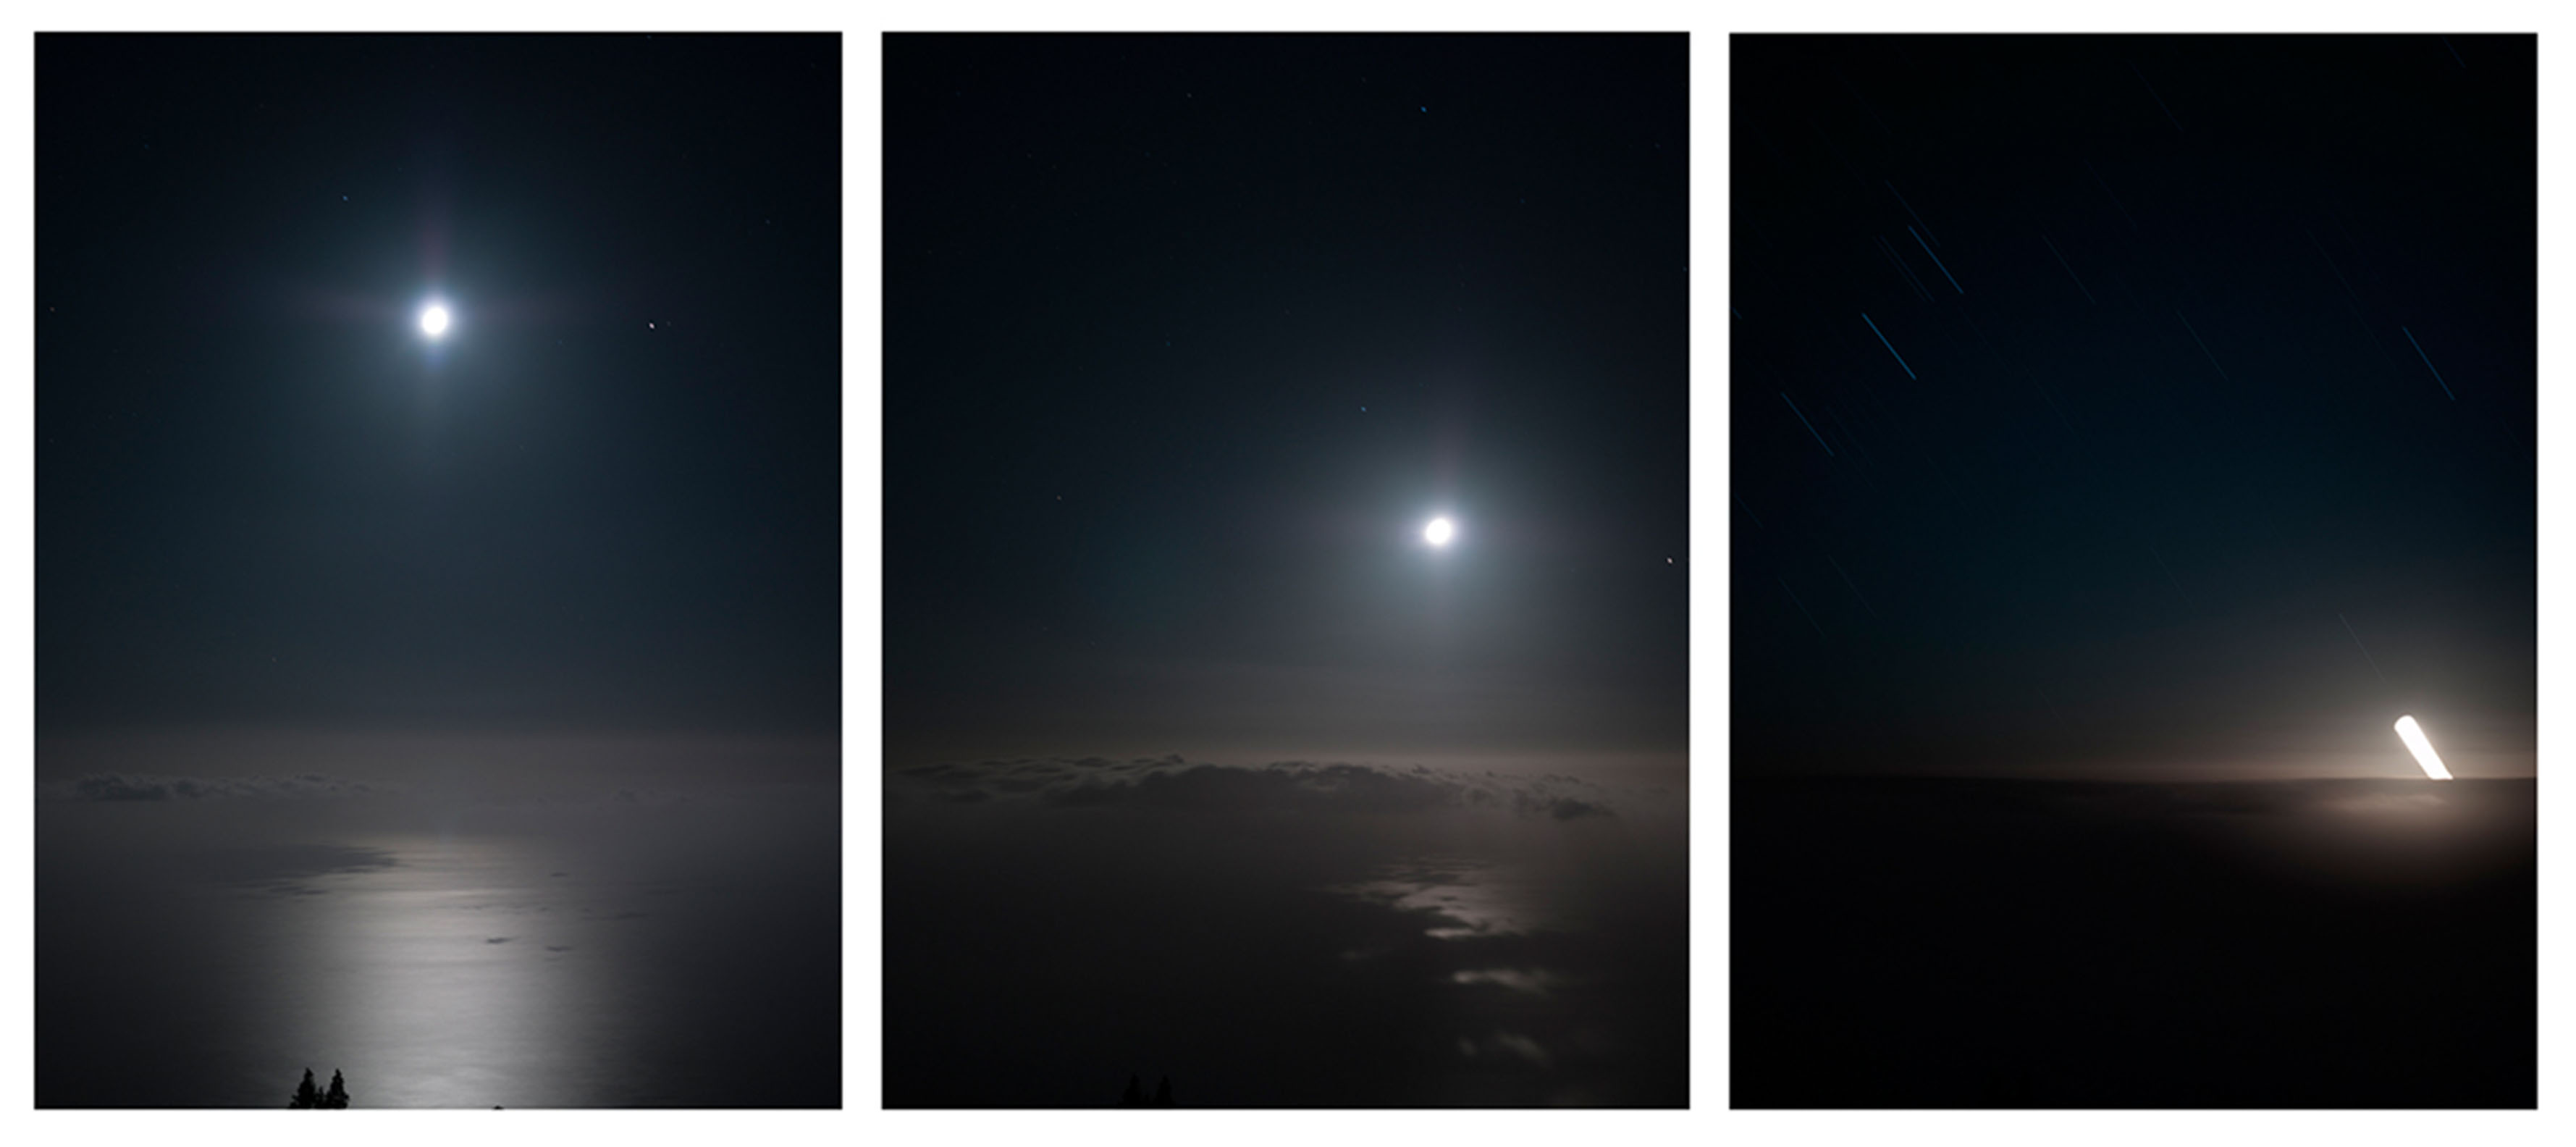 2. Moonseta